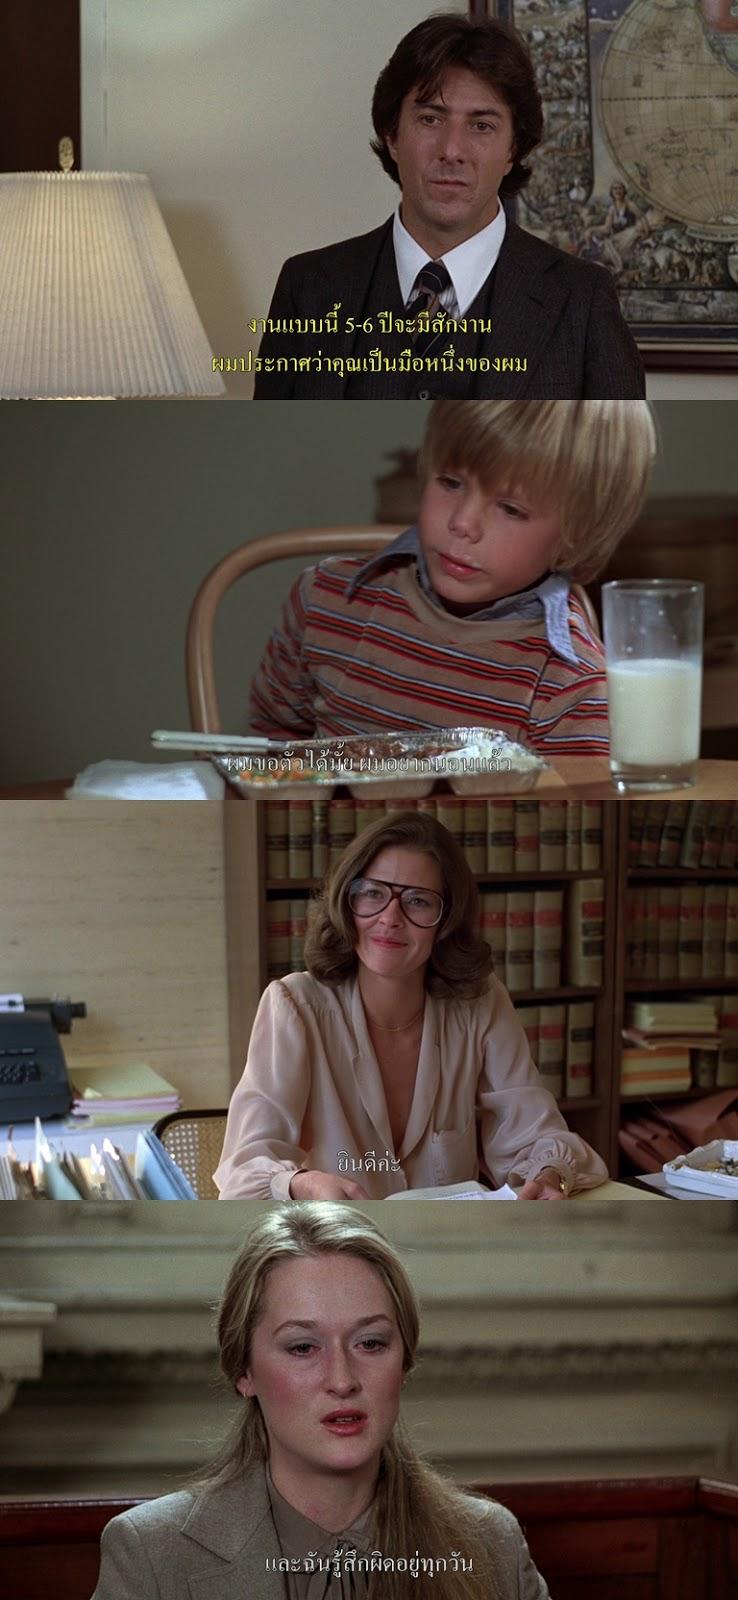 [MINI-HD] KRAMER VS. KRAMER (1979) พ่อ แม่ ลูก [1080P HQ] [เสียงไทยมาสเตอร์ 5.1 + ENG DTS] [บรรยายไทย + อังกฤษ] ZAKKY-KMM